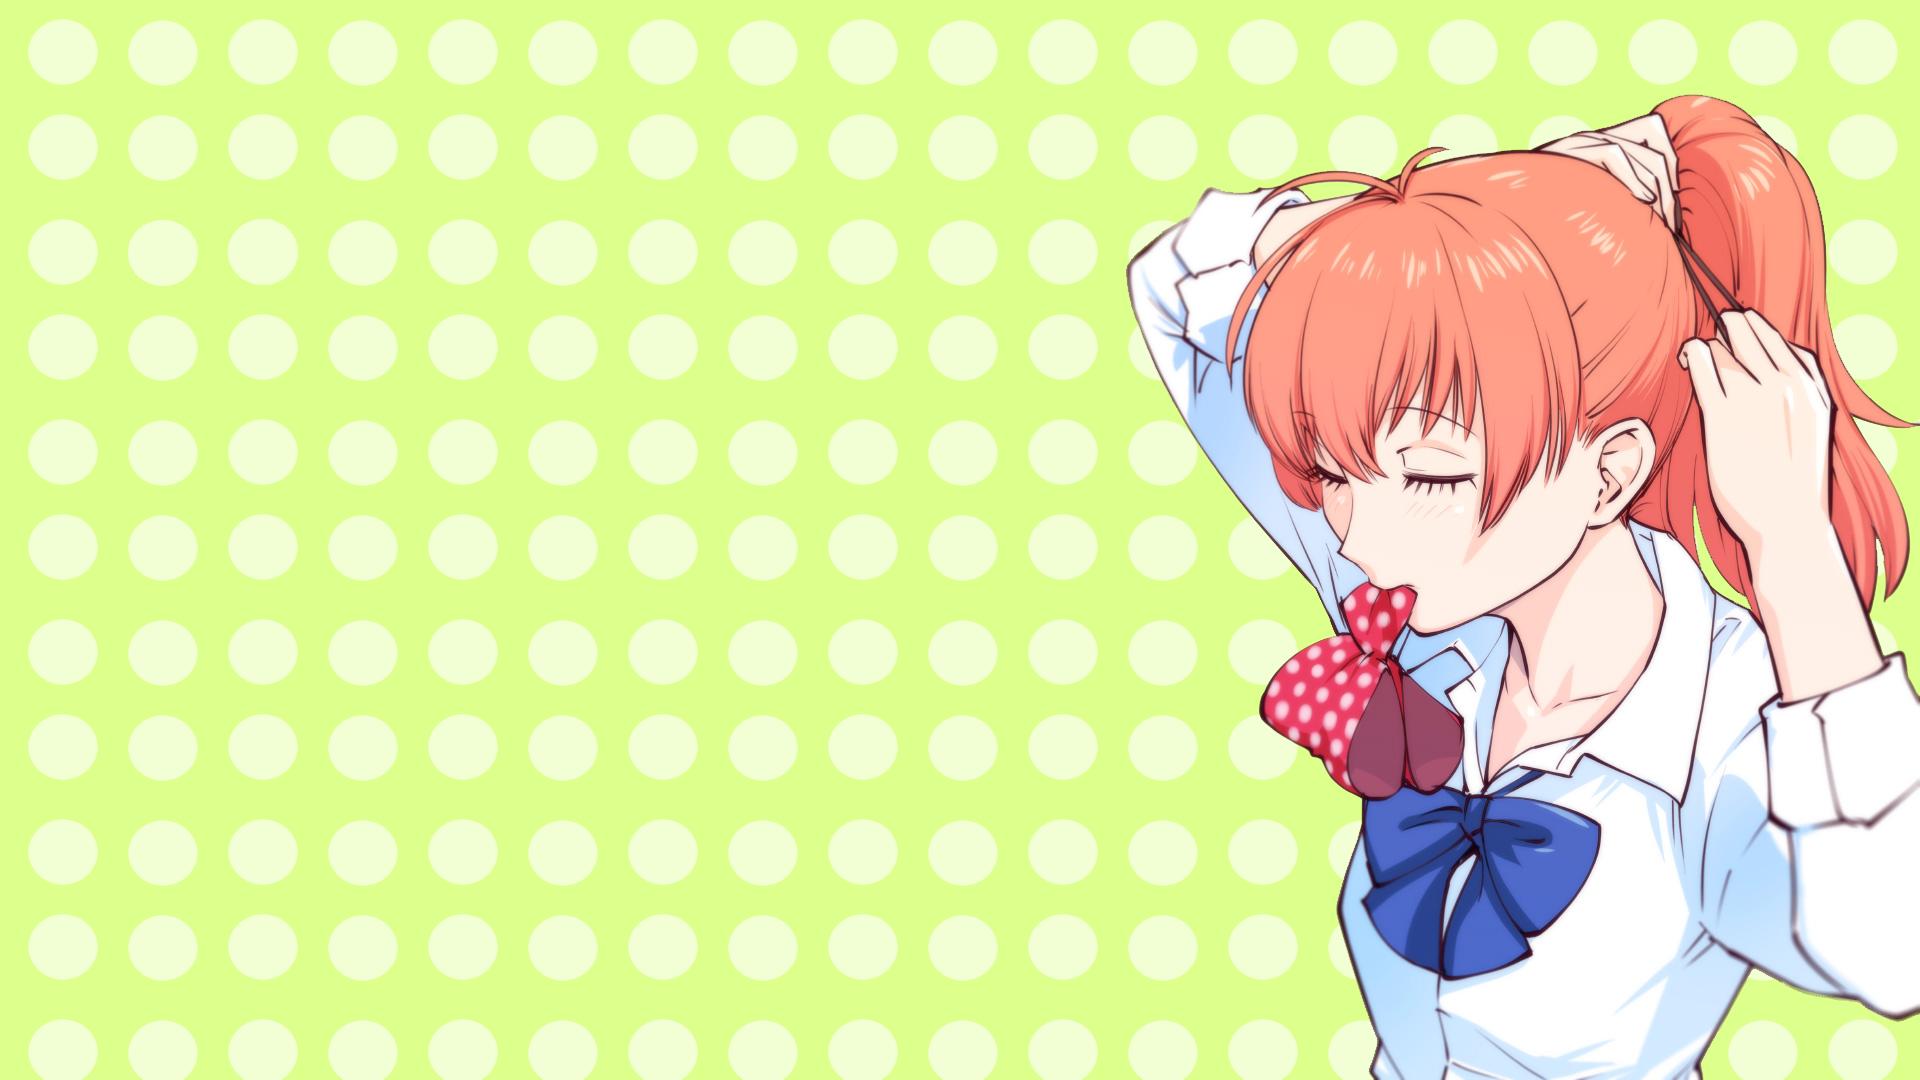 Monthly Girls Nozaki Kun Hd Wallpaper Background Image